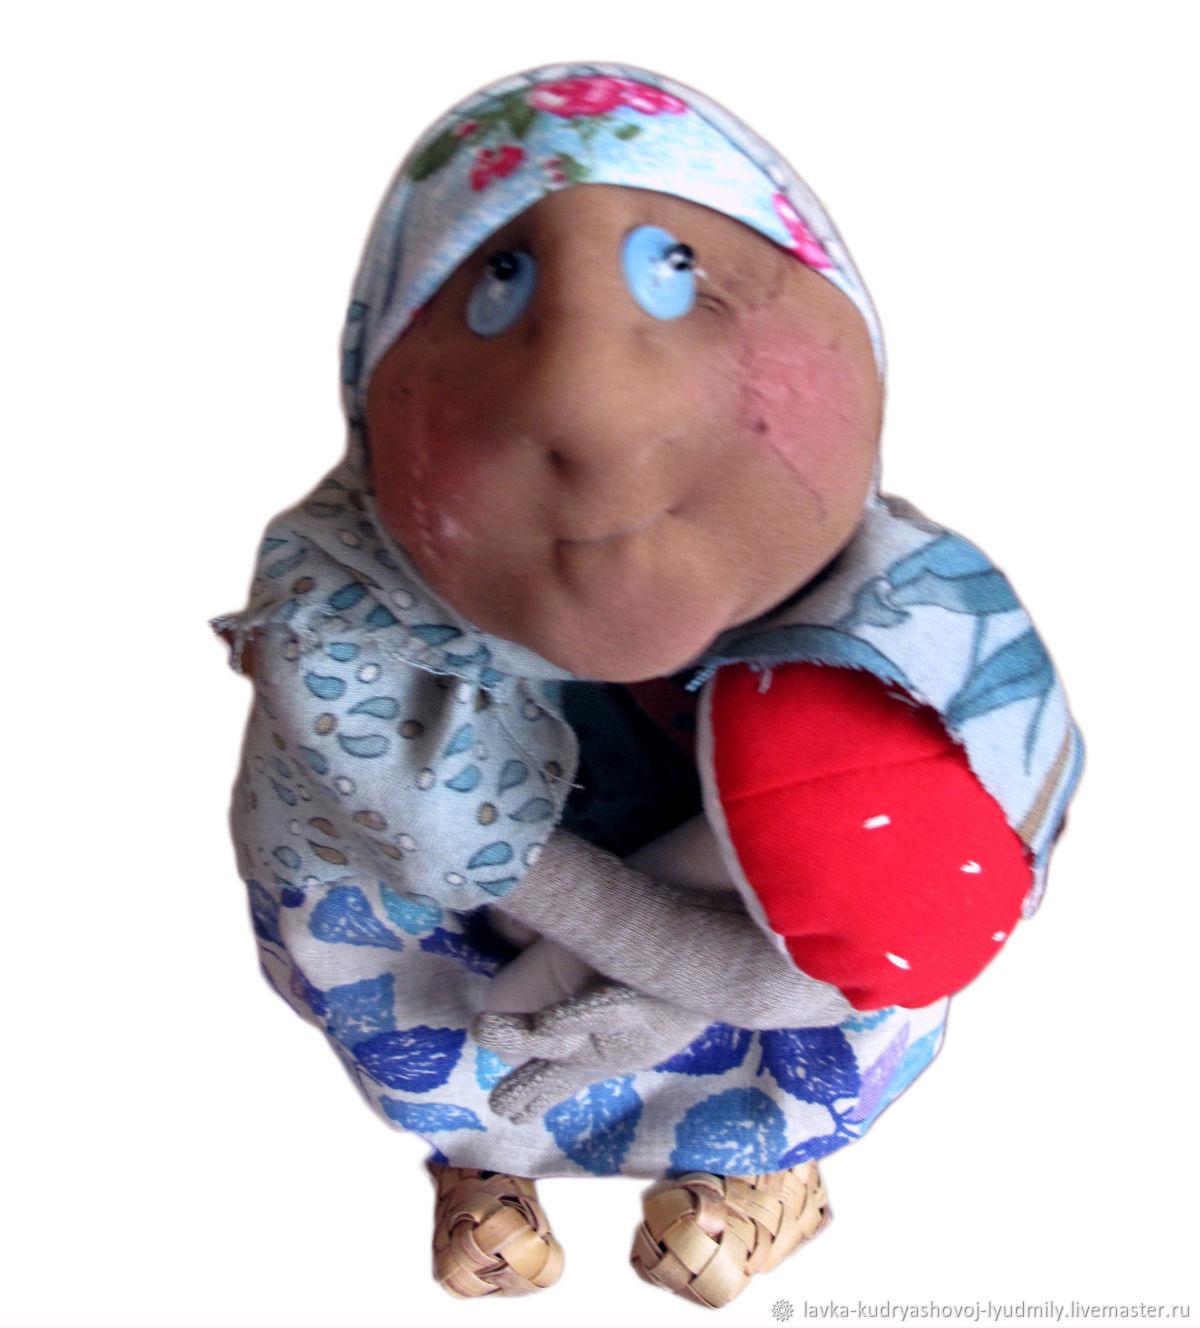 Баба Яга с мухомором, Мягкие игрушки, Великий Новгород,  Фото №1